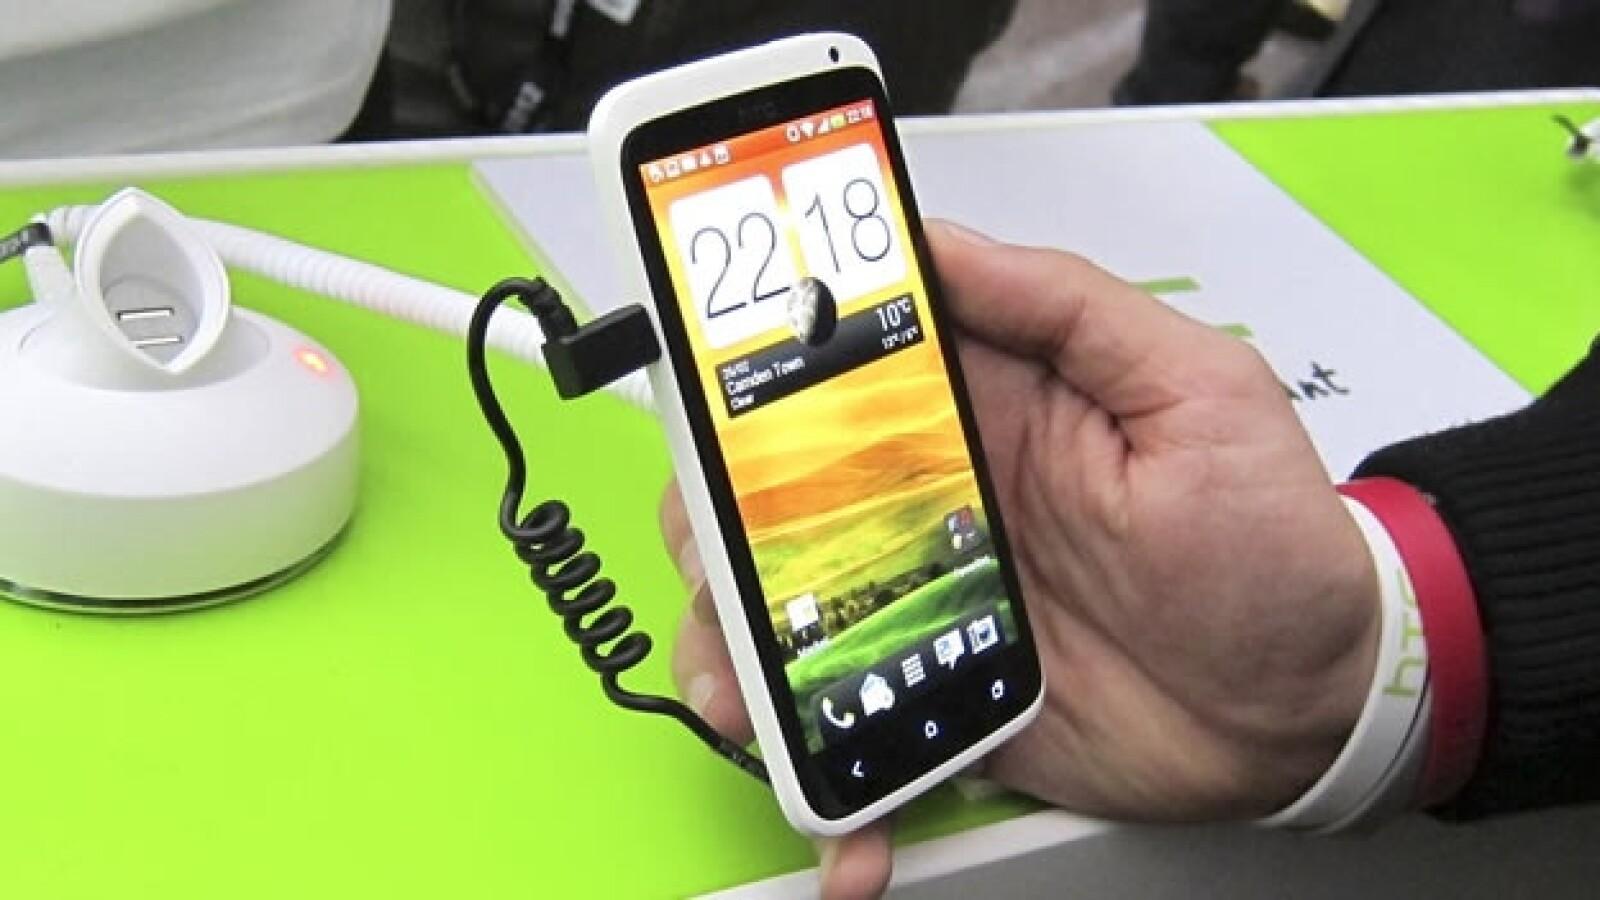 World Mobile Congress 2012